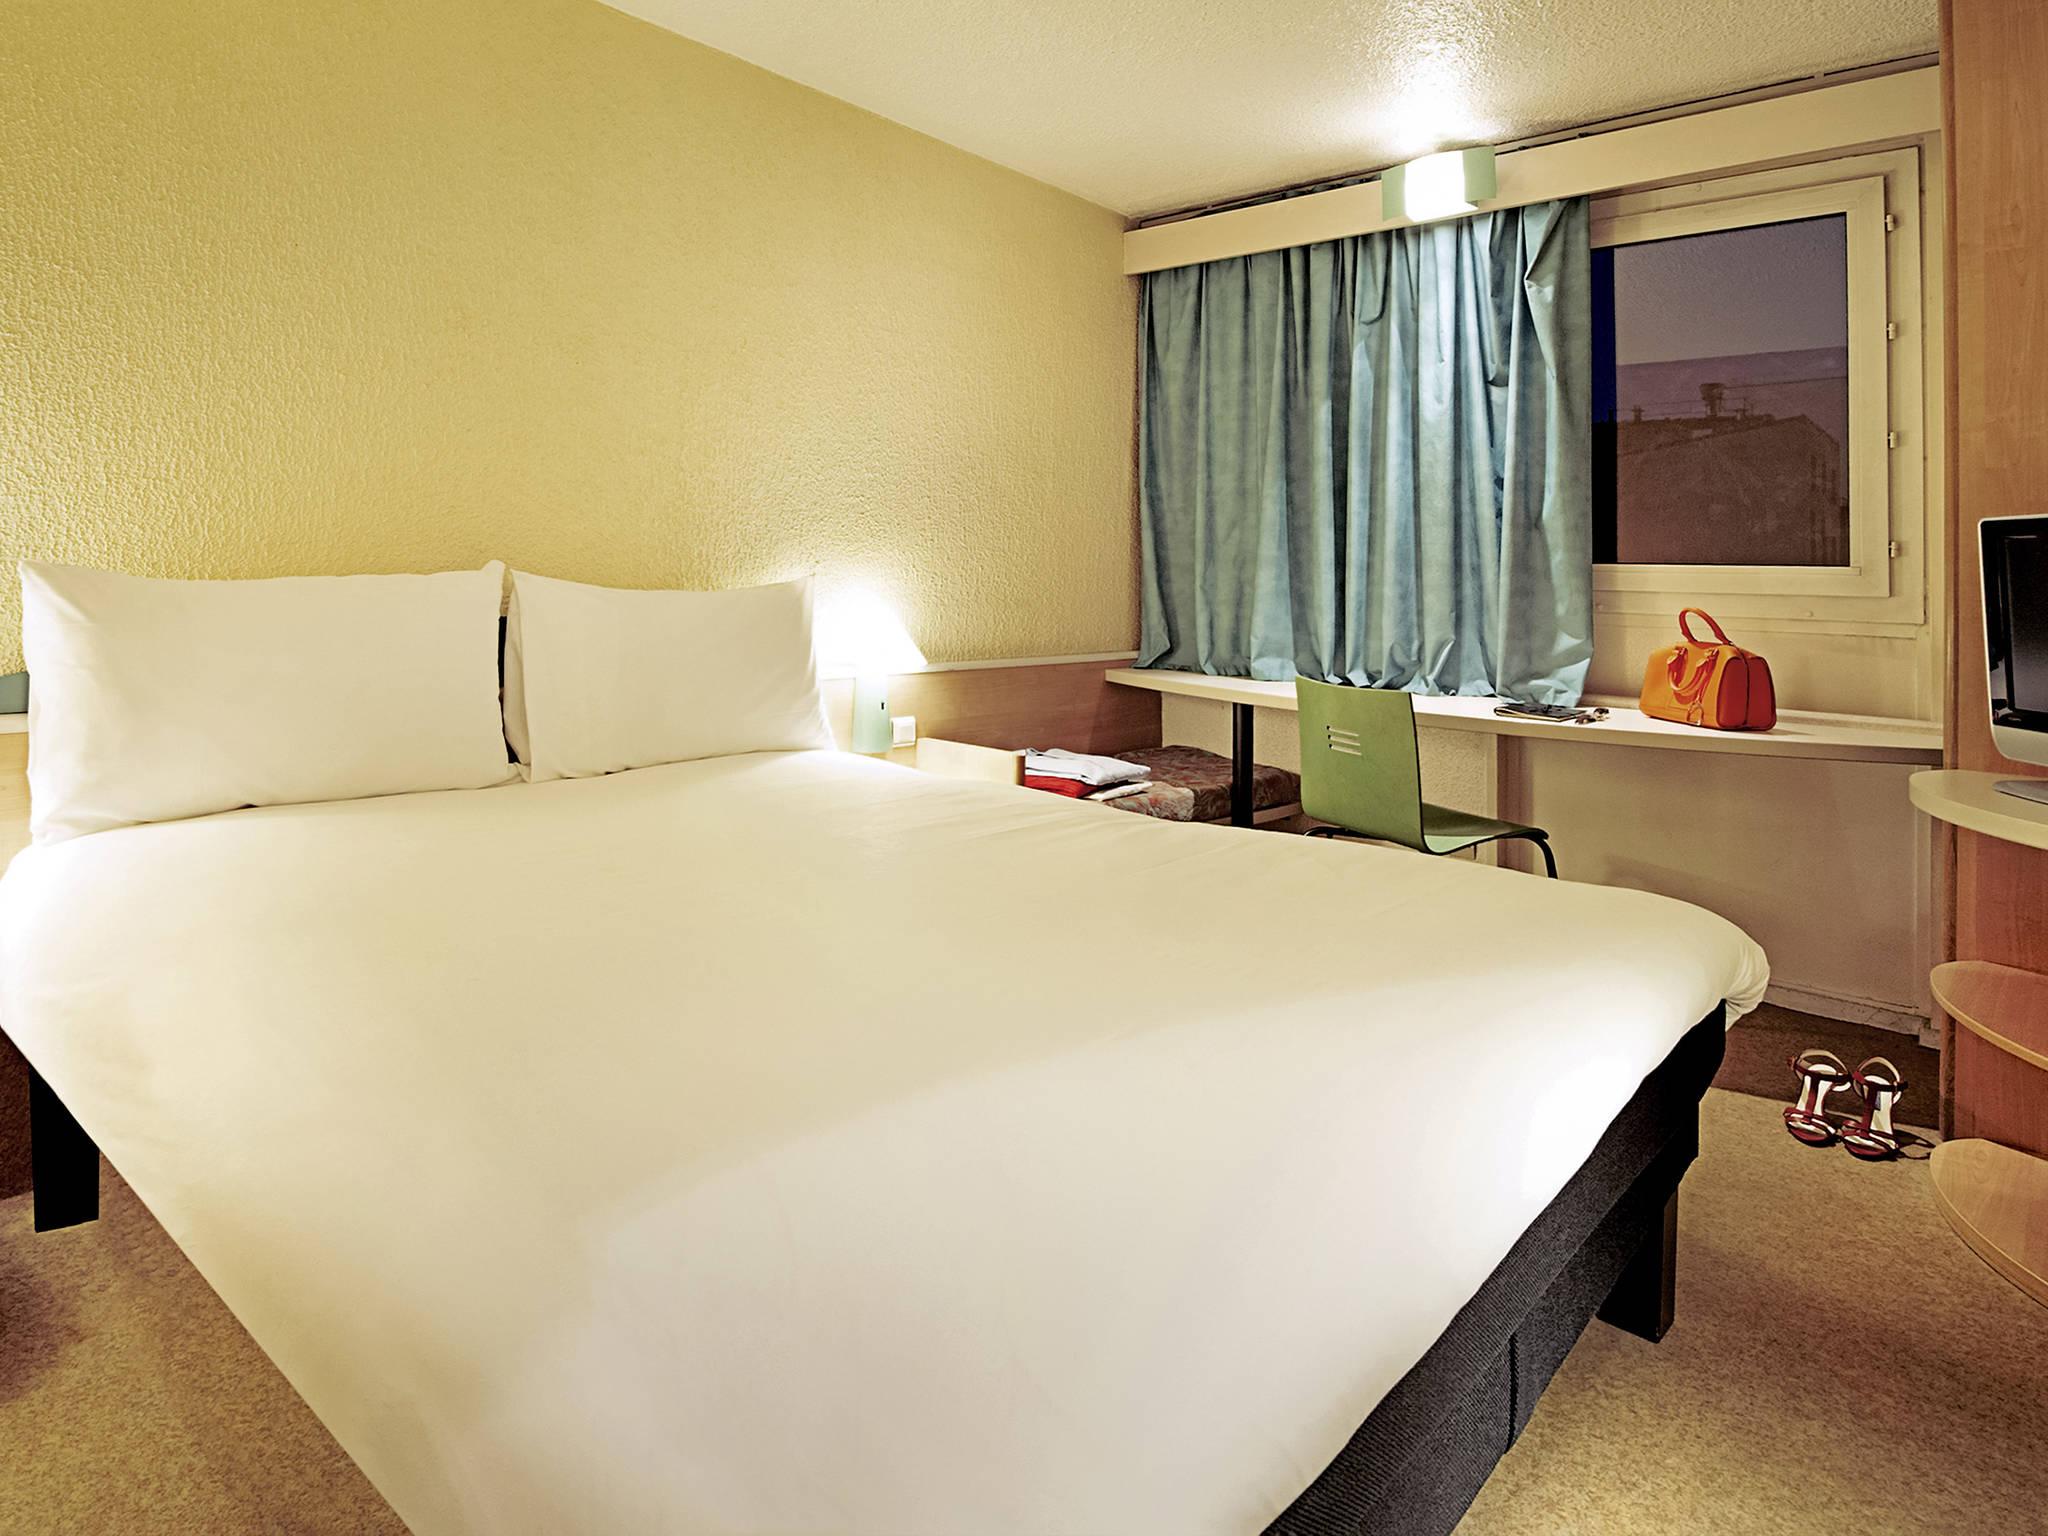 Hôtel - ibis Madrid Alcorcon Tresaguas